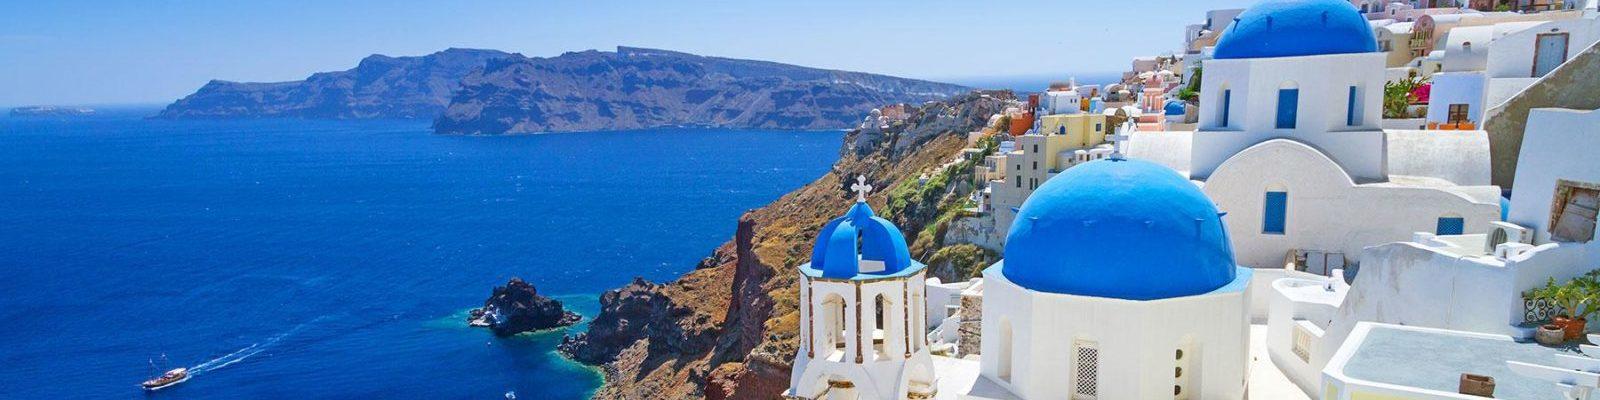 Santorini-caldera-oia-blue-domes-1600x500